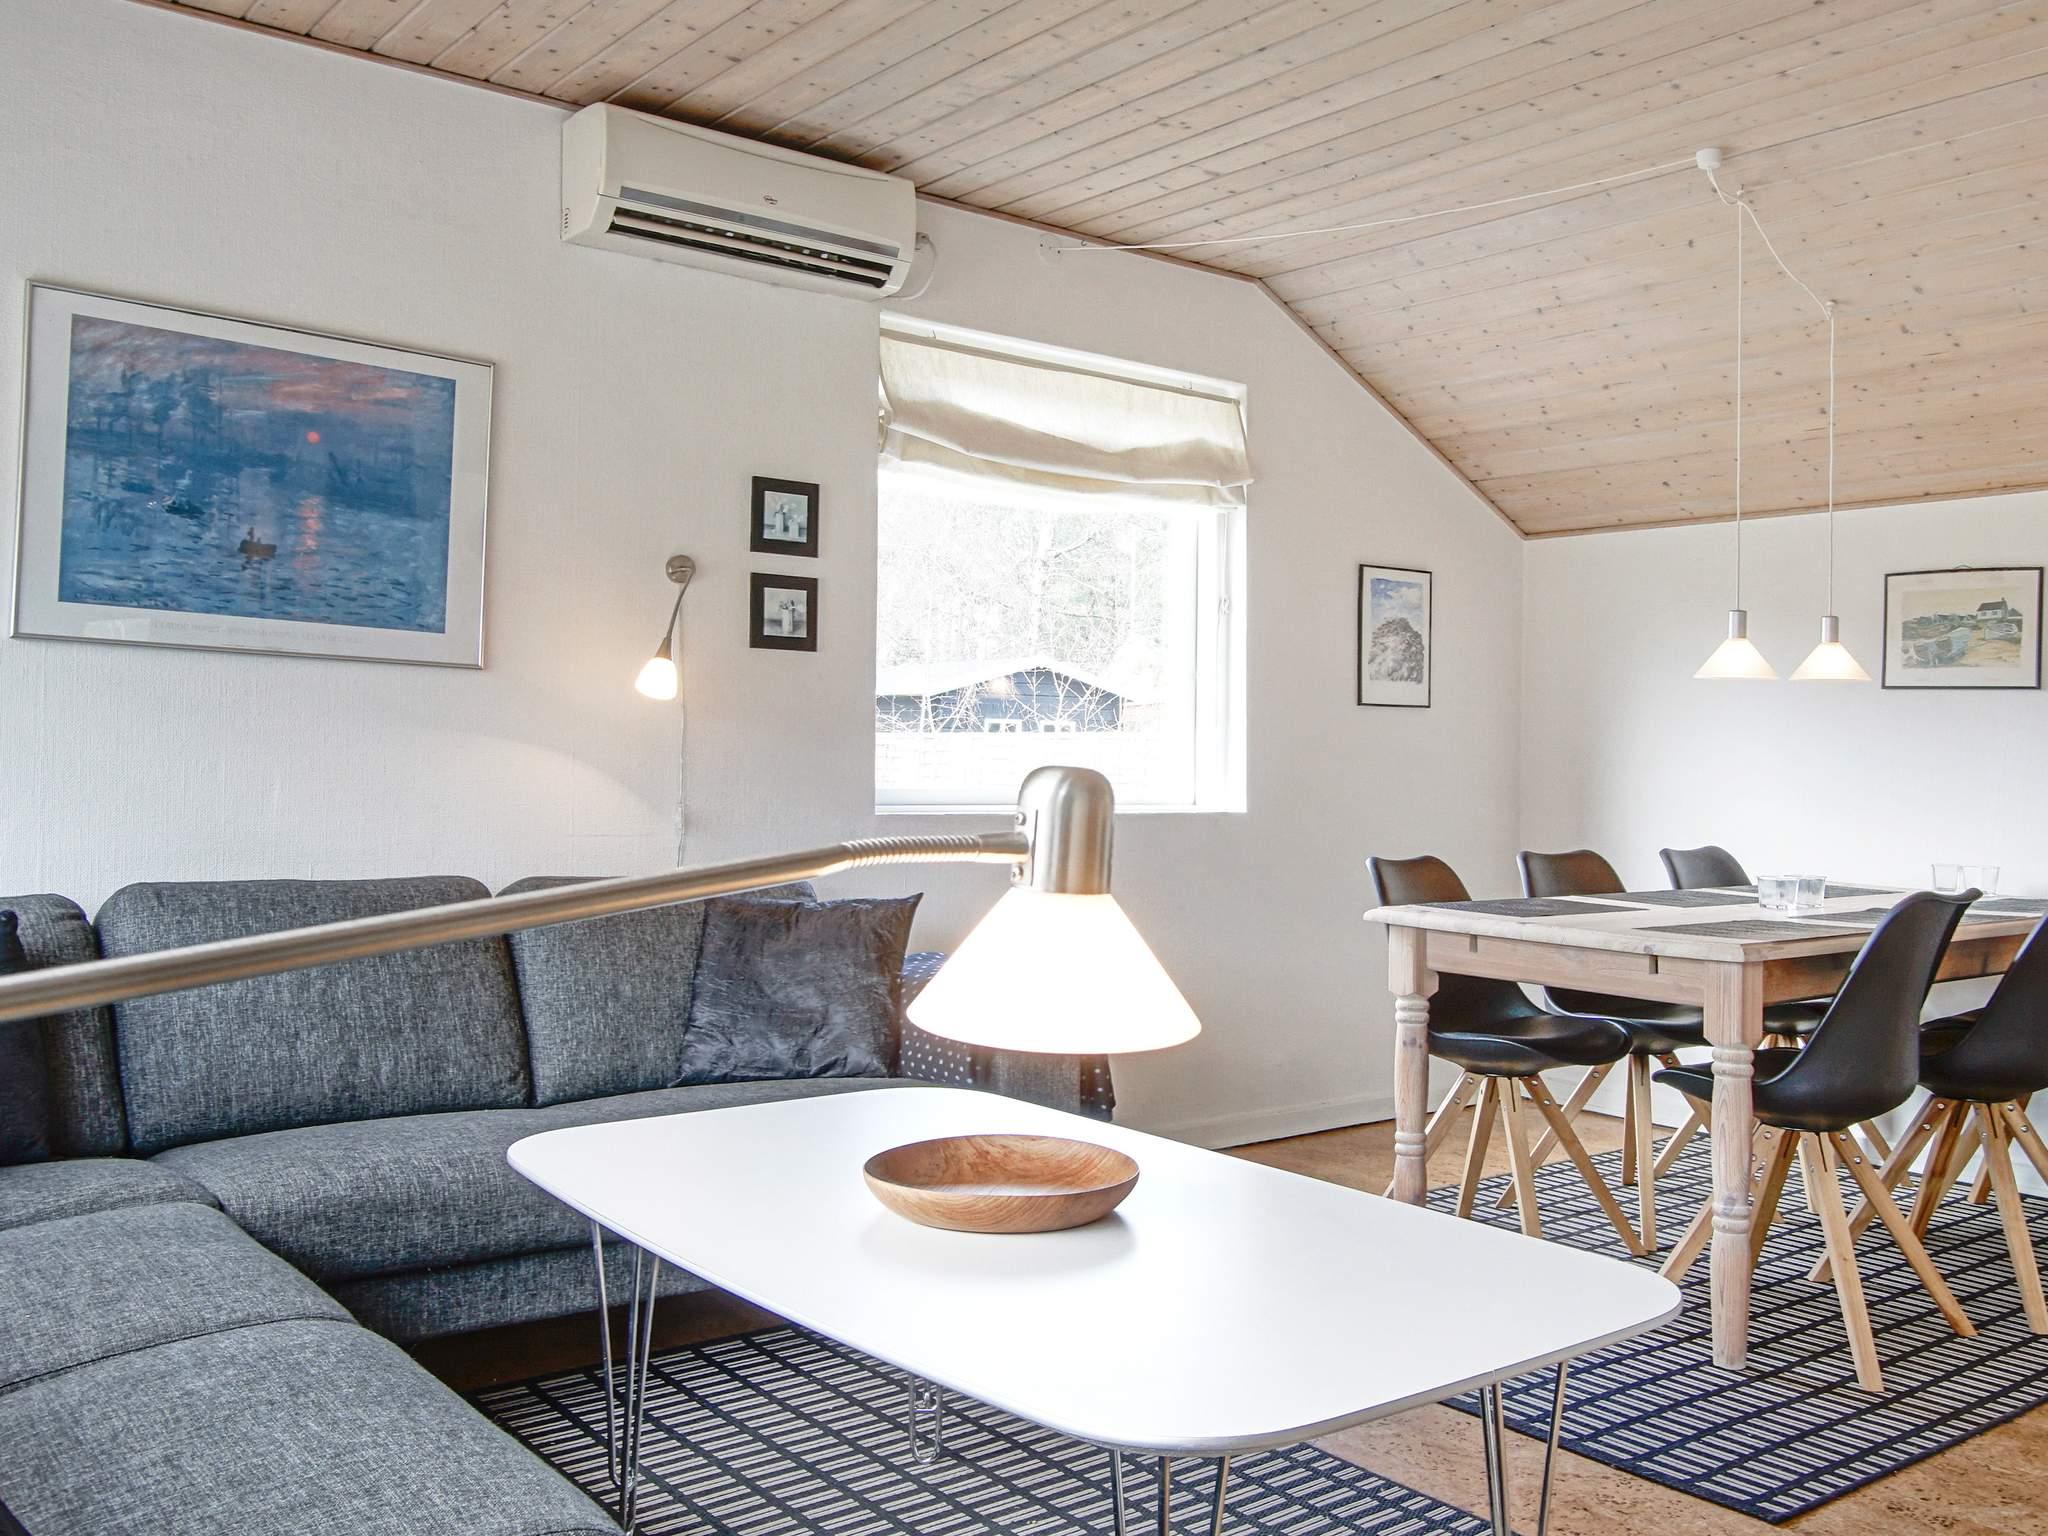 Ferienhaus Balka Strand (82287), Balke, , Bornholm, Dänemark, Bild 4